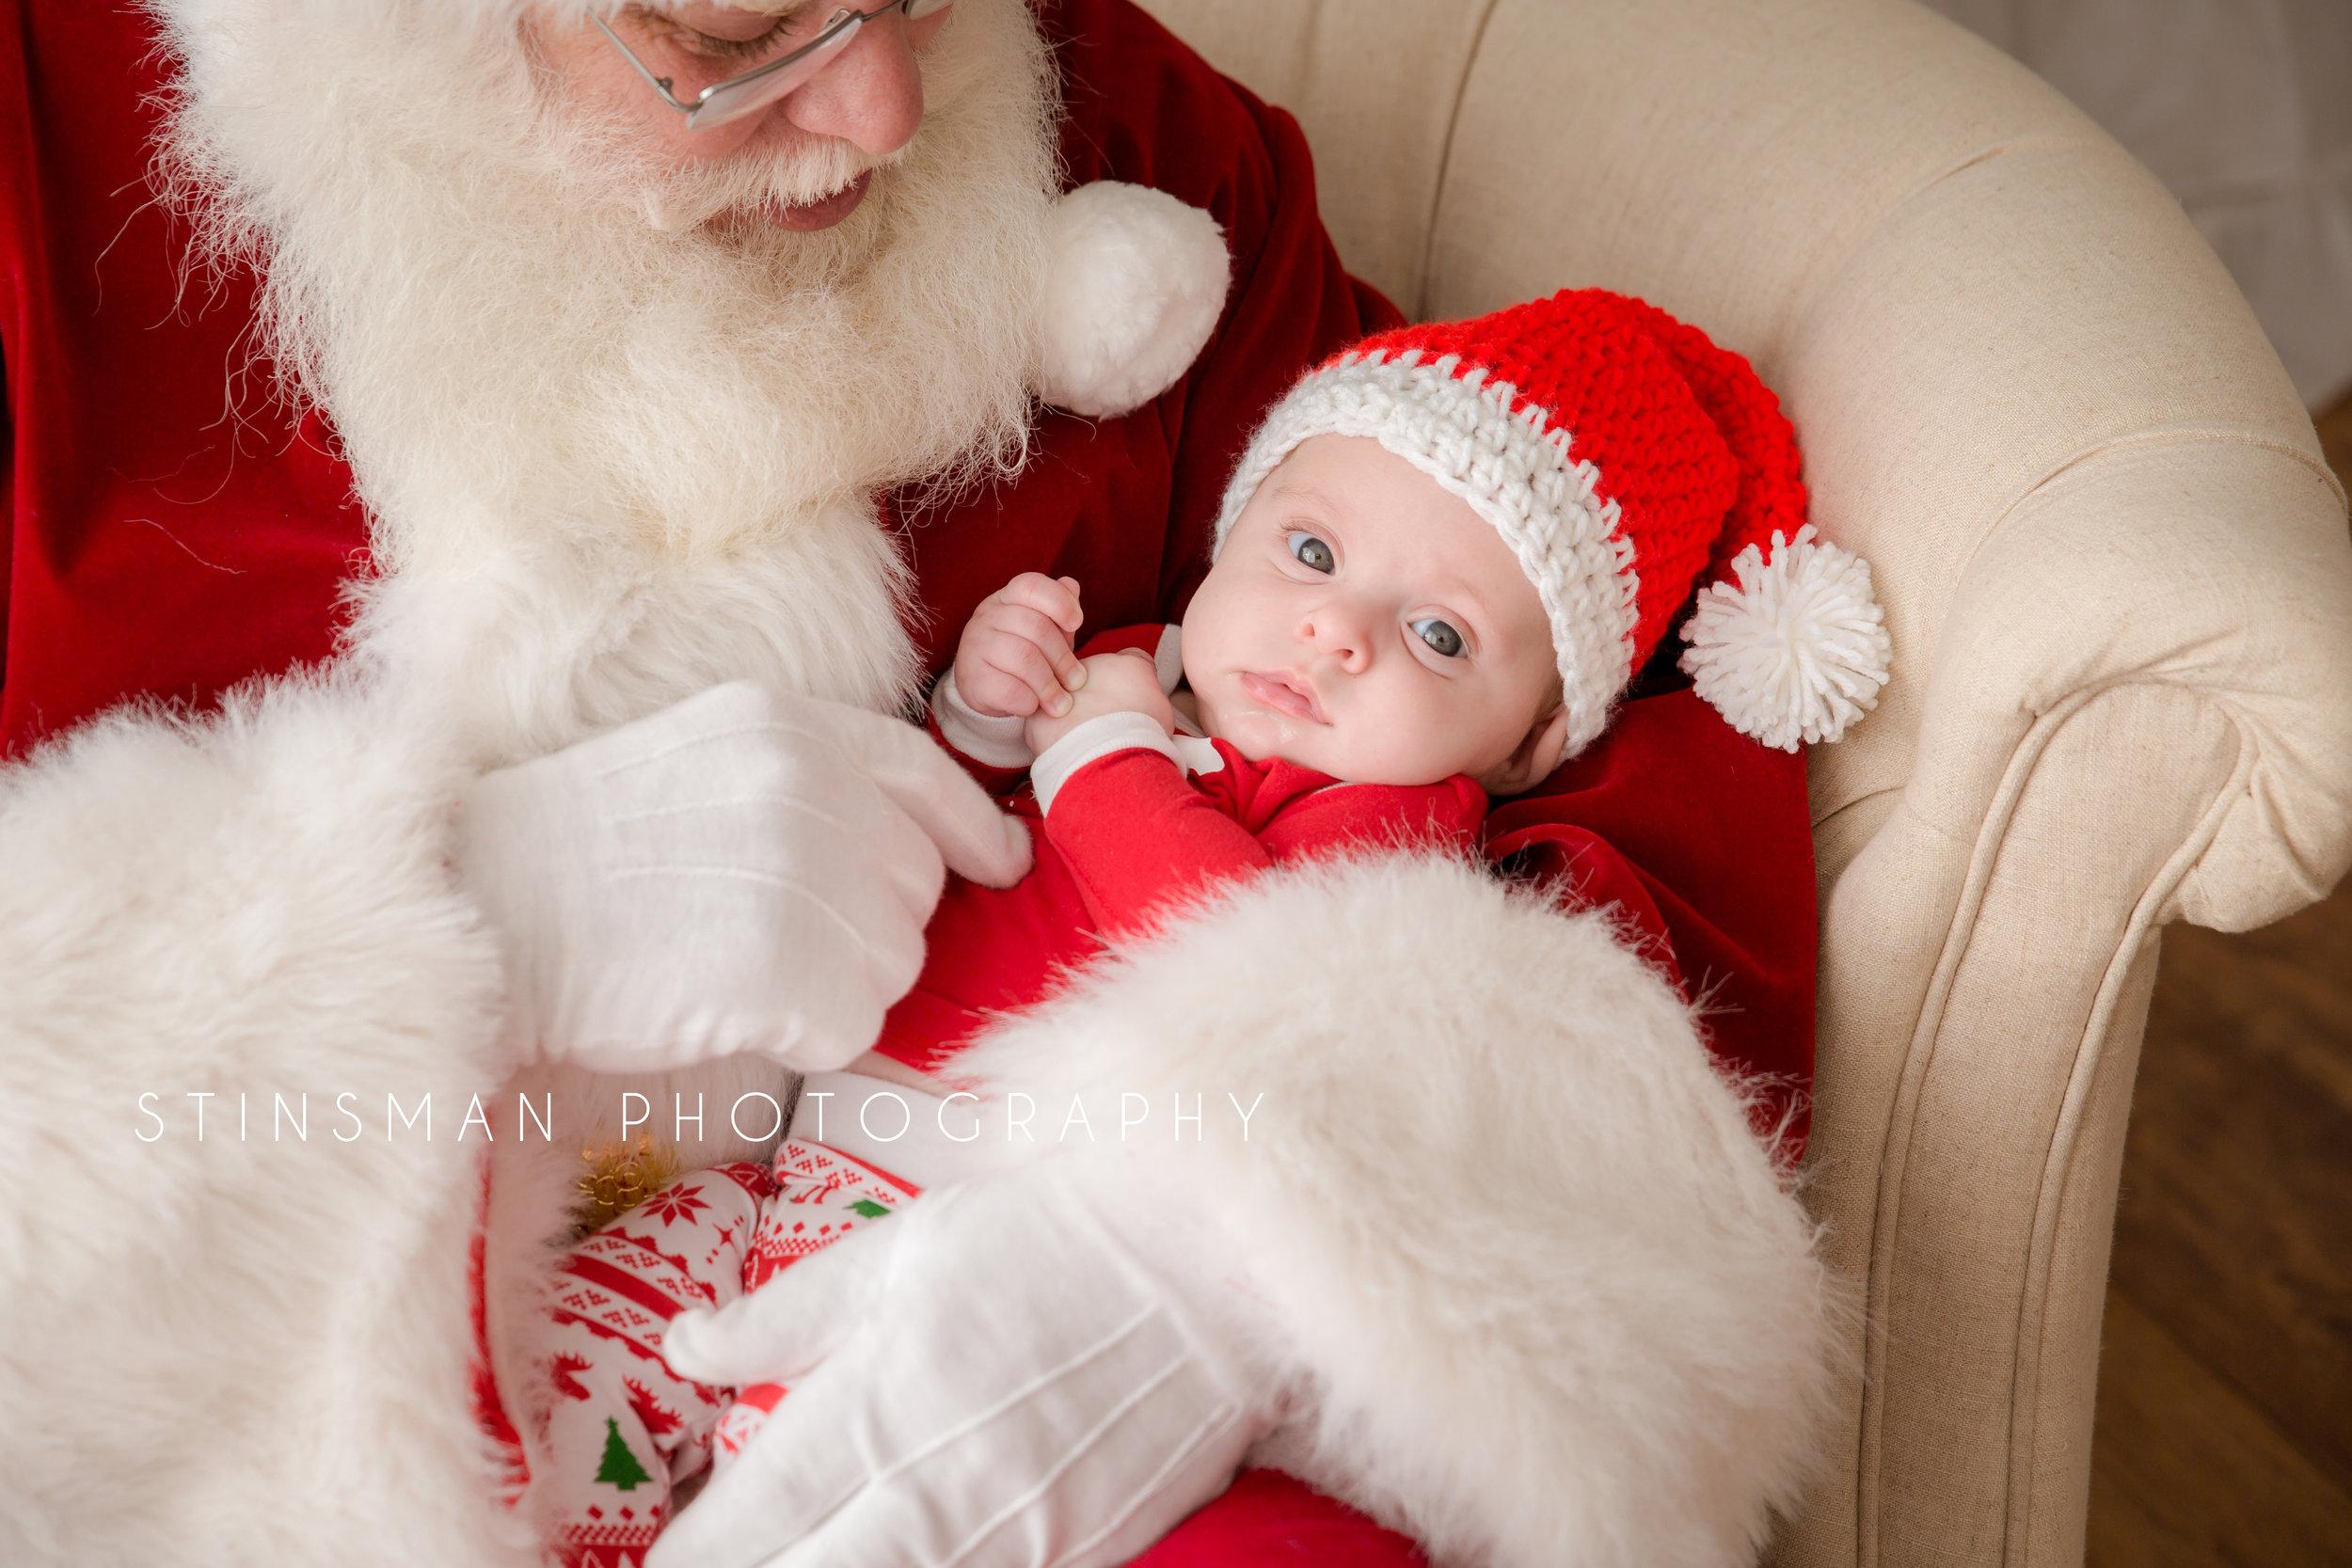 Santa holding a newborn baby girl